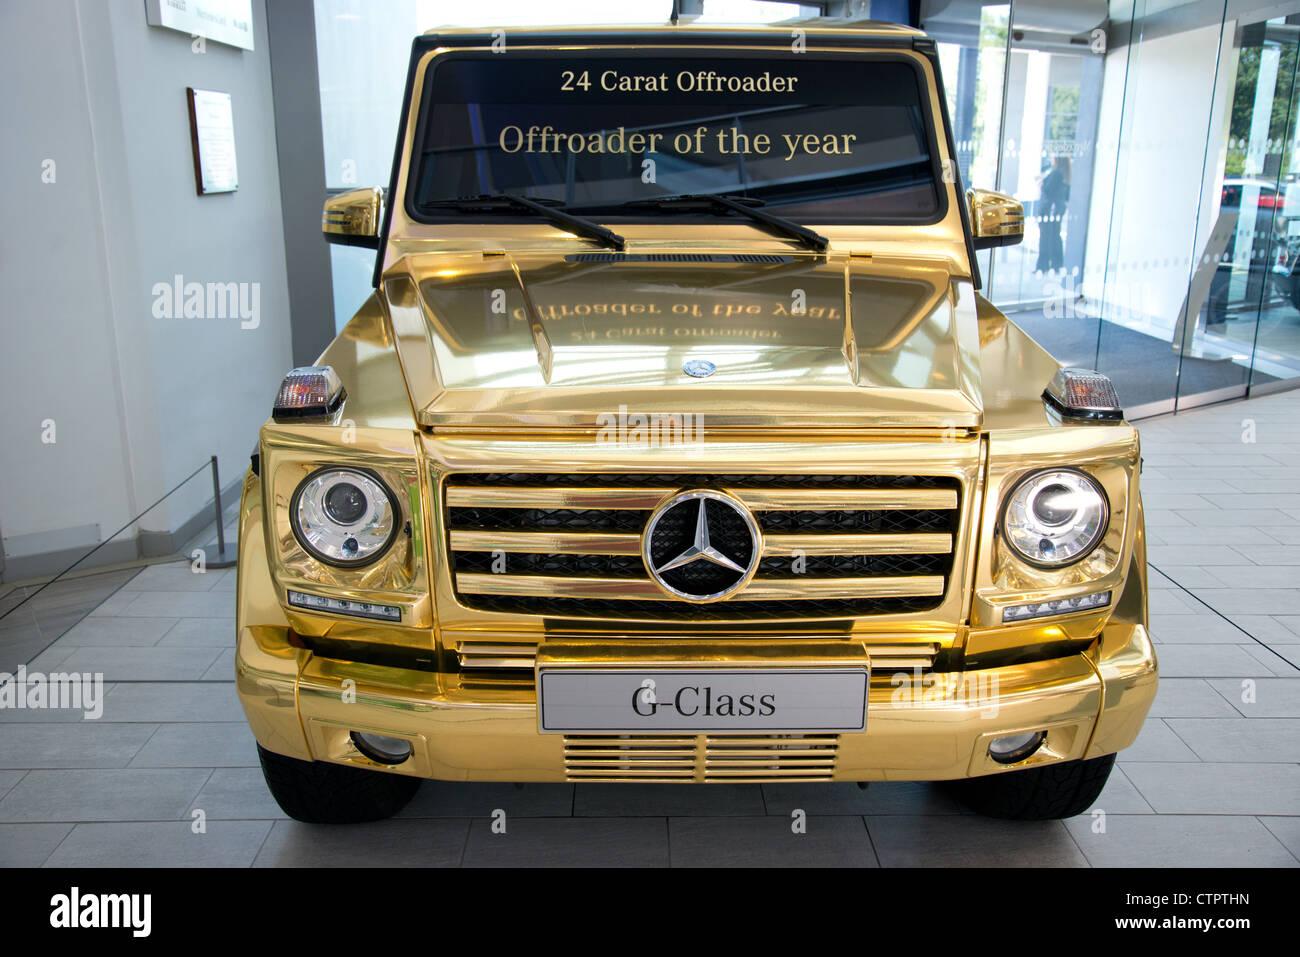 24 carat mercedes offroader car displayed in mercedes benz for Mercedes benz worldwide